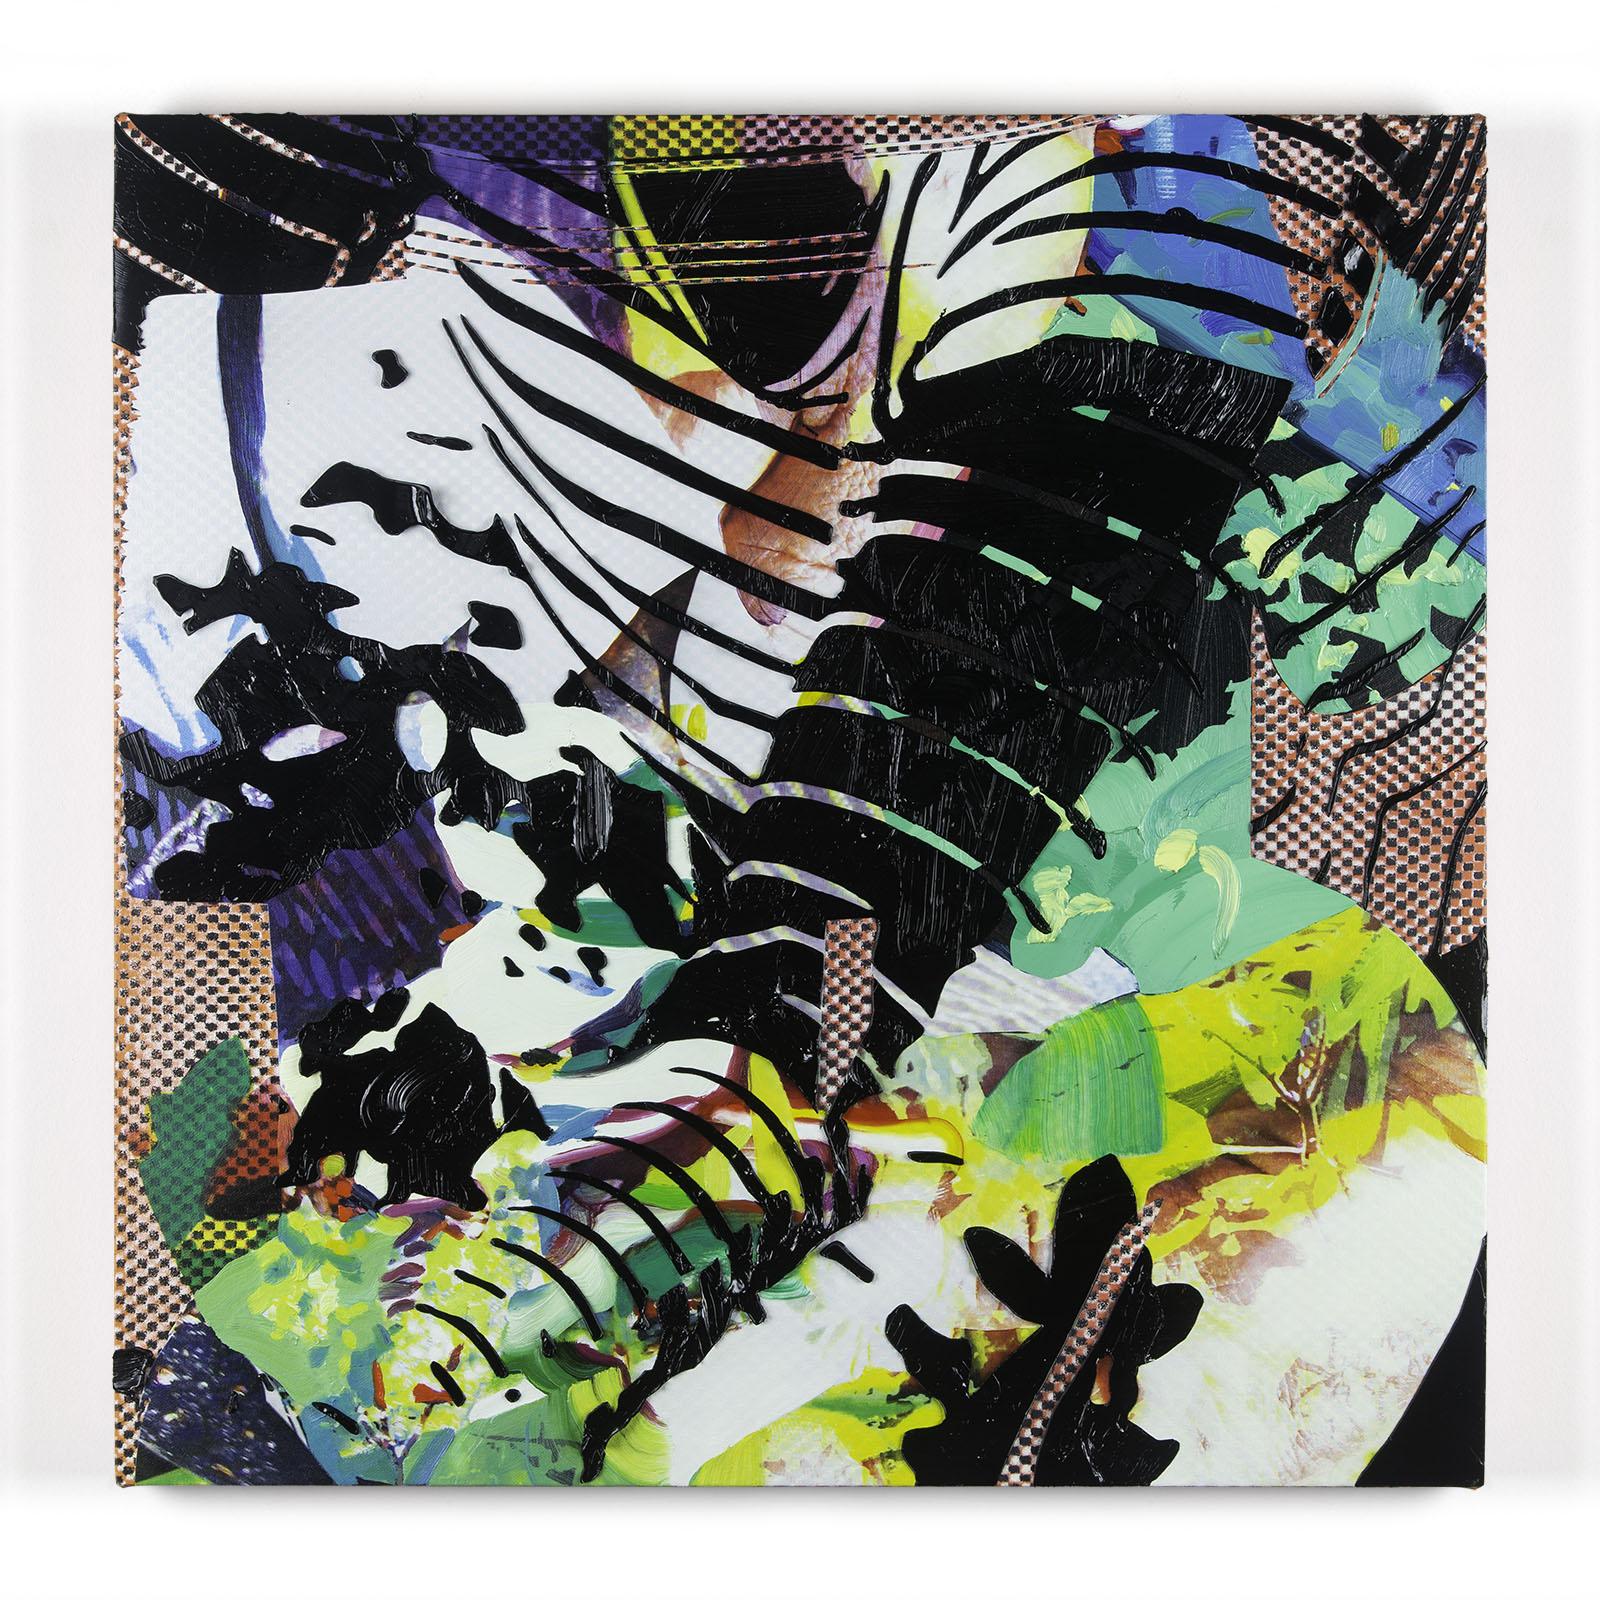 Jimmy Baker, American artist, painting, digital printing : The Politics of Gardening 1 painting